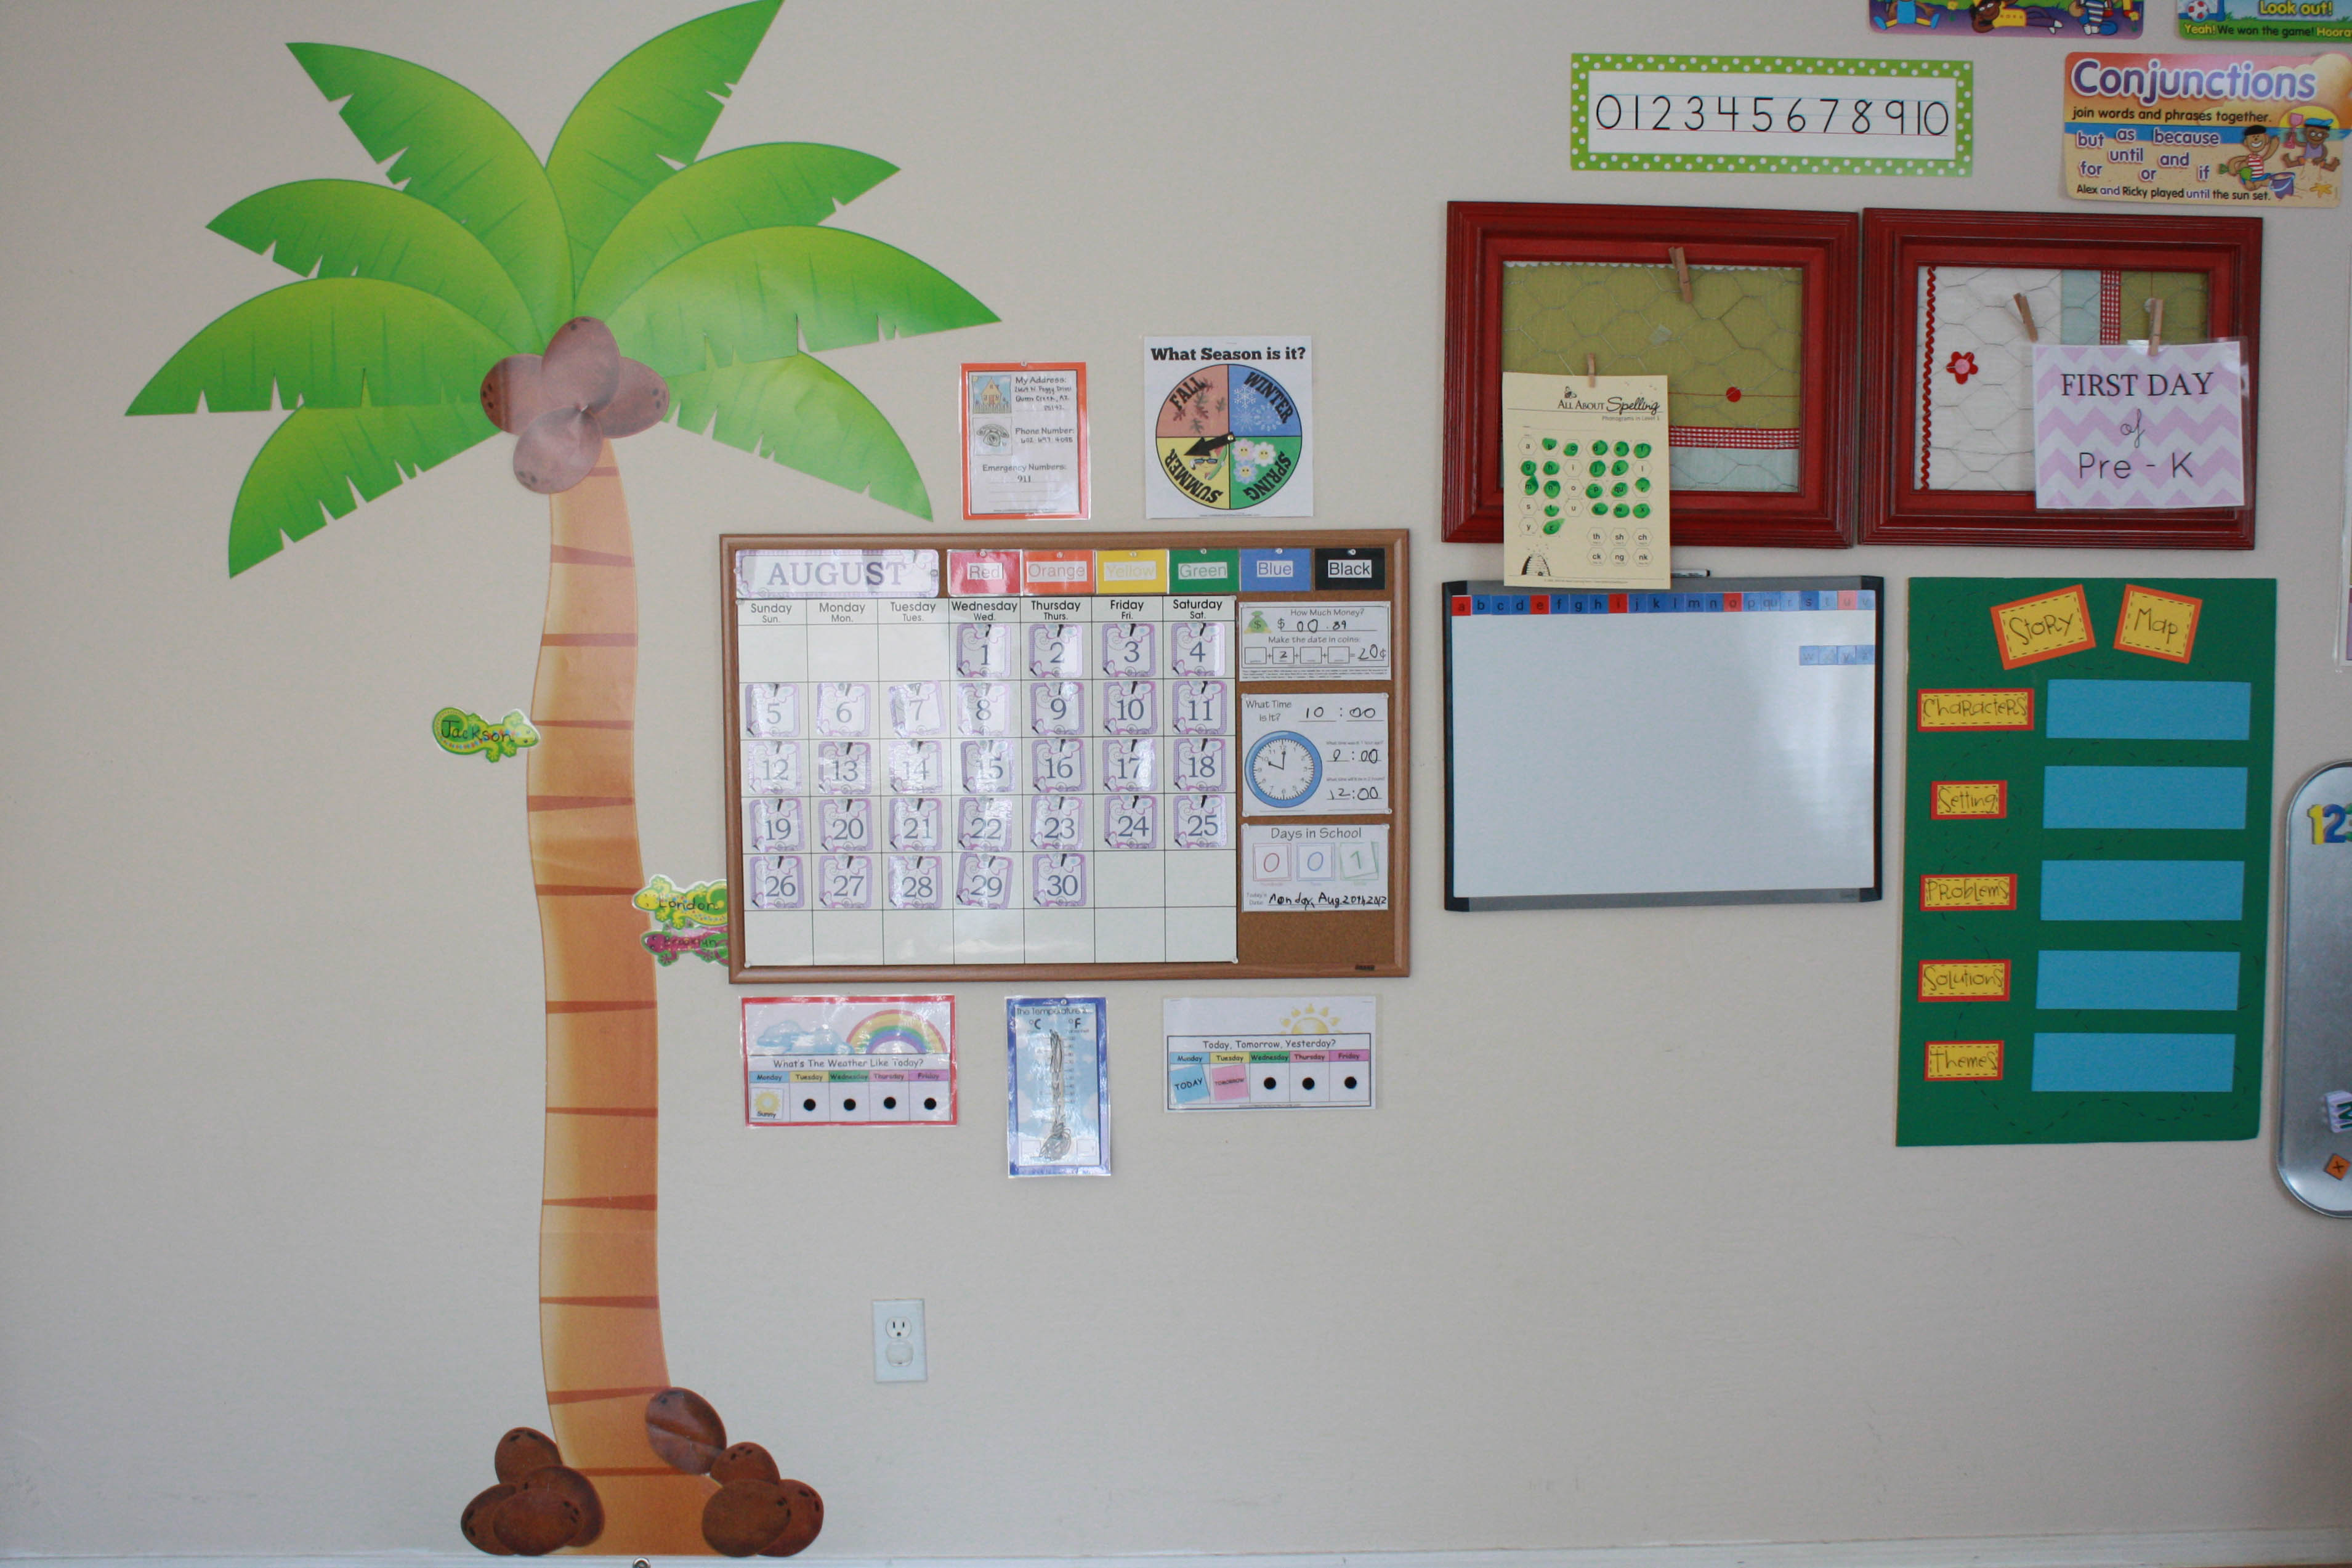 Palm tree restaurant logo 3 letters diymid com